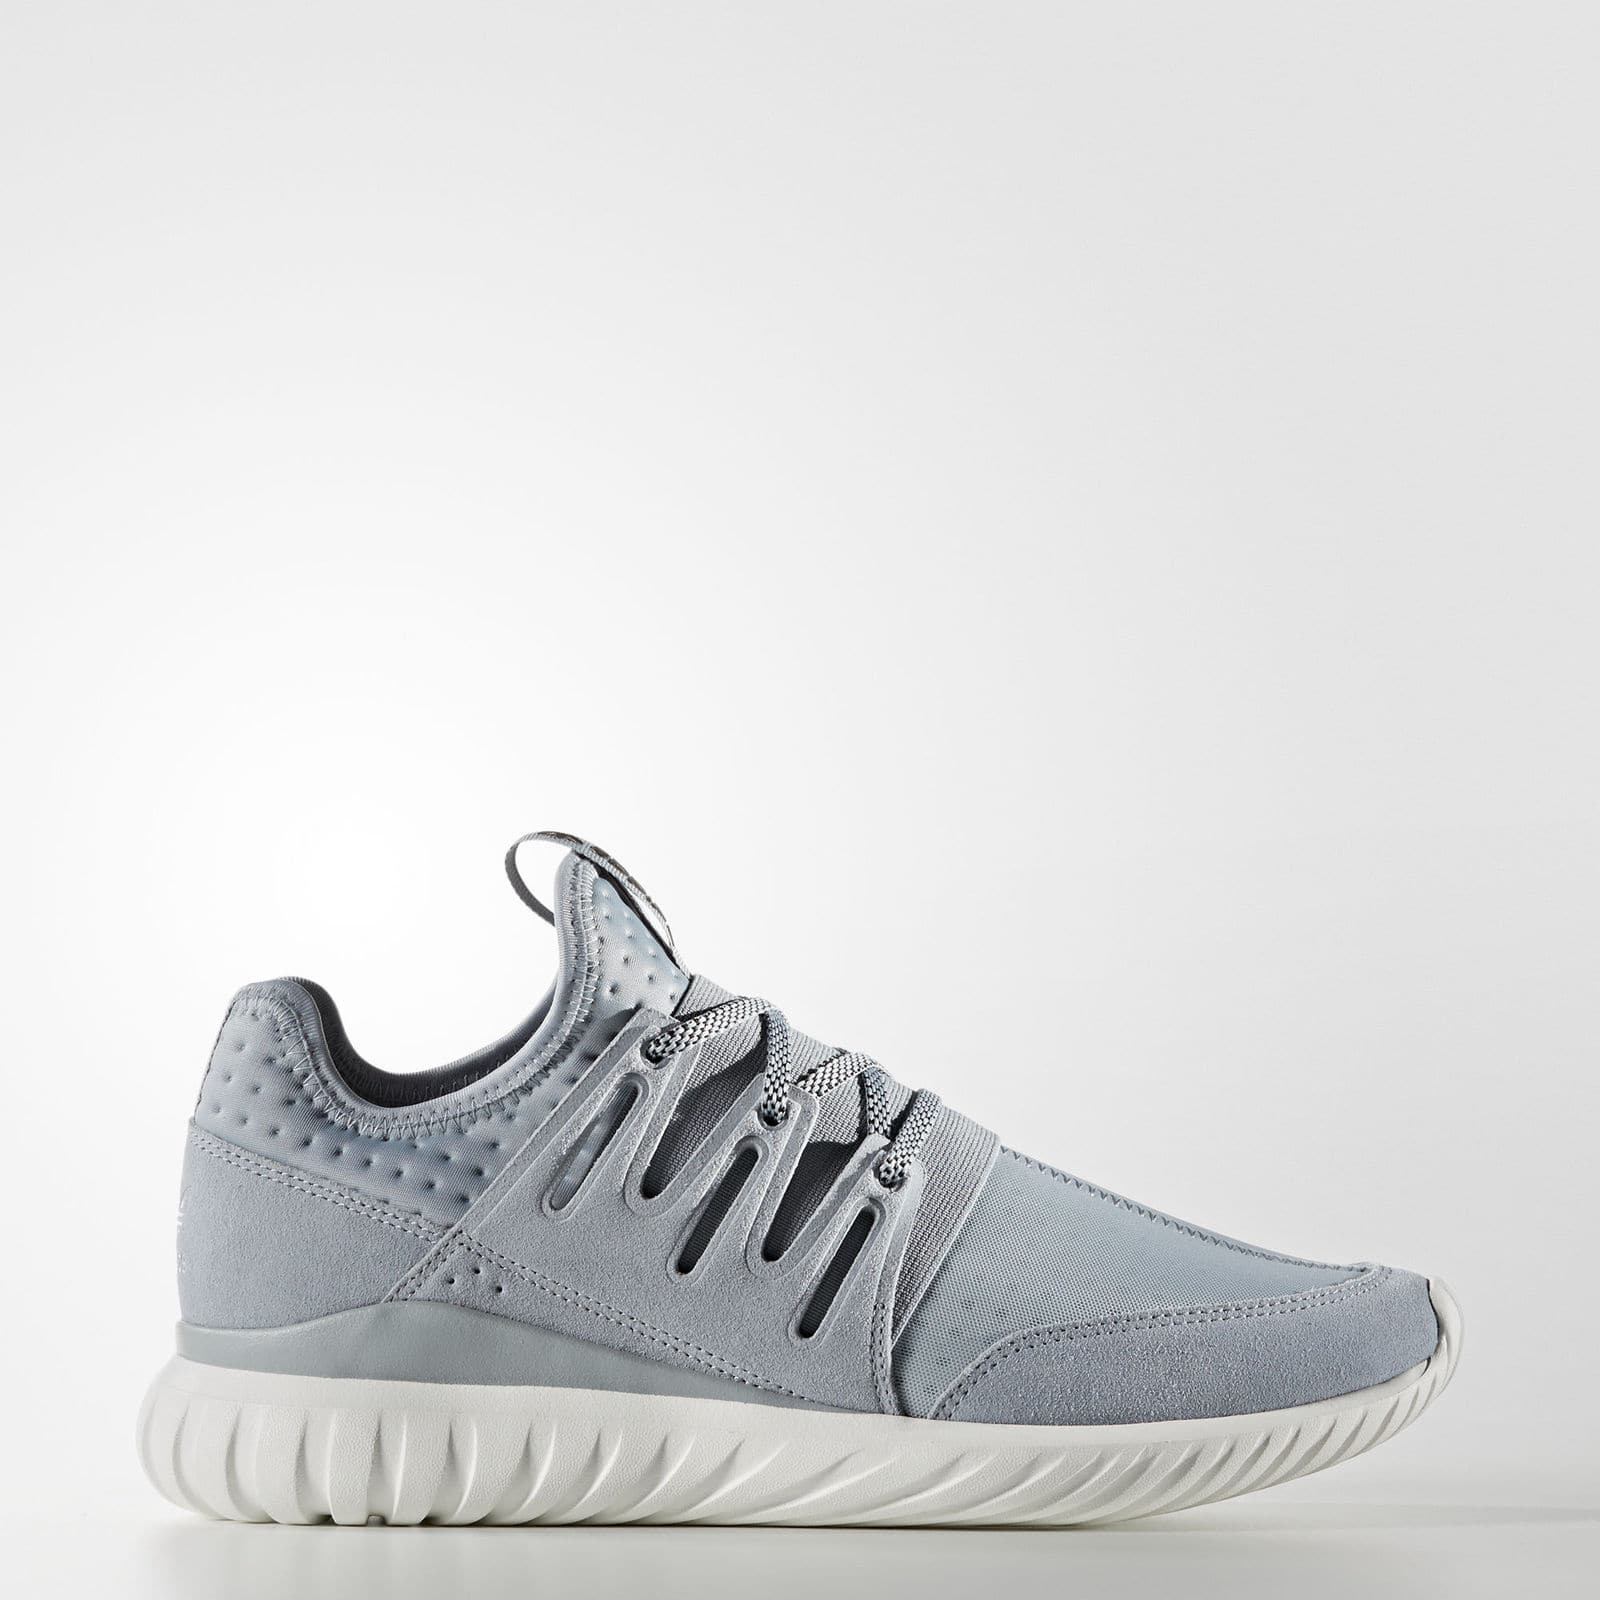 adidas Men's Tubular Radial Shoes $39.99